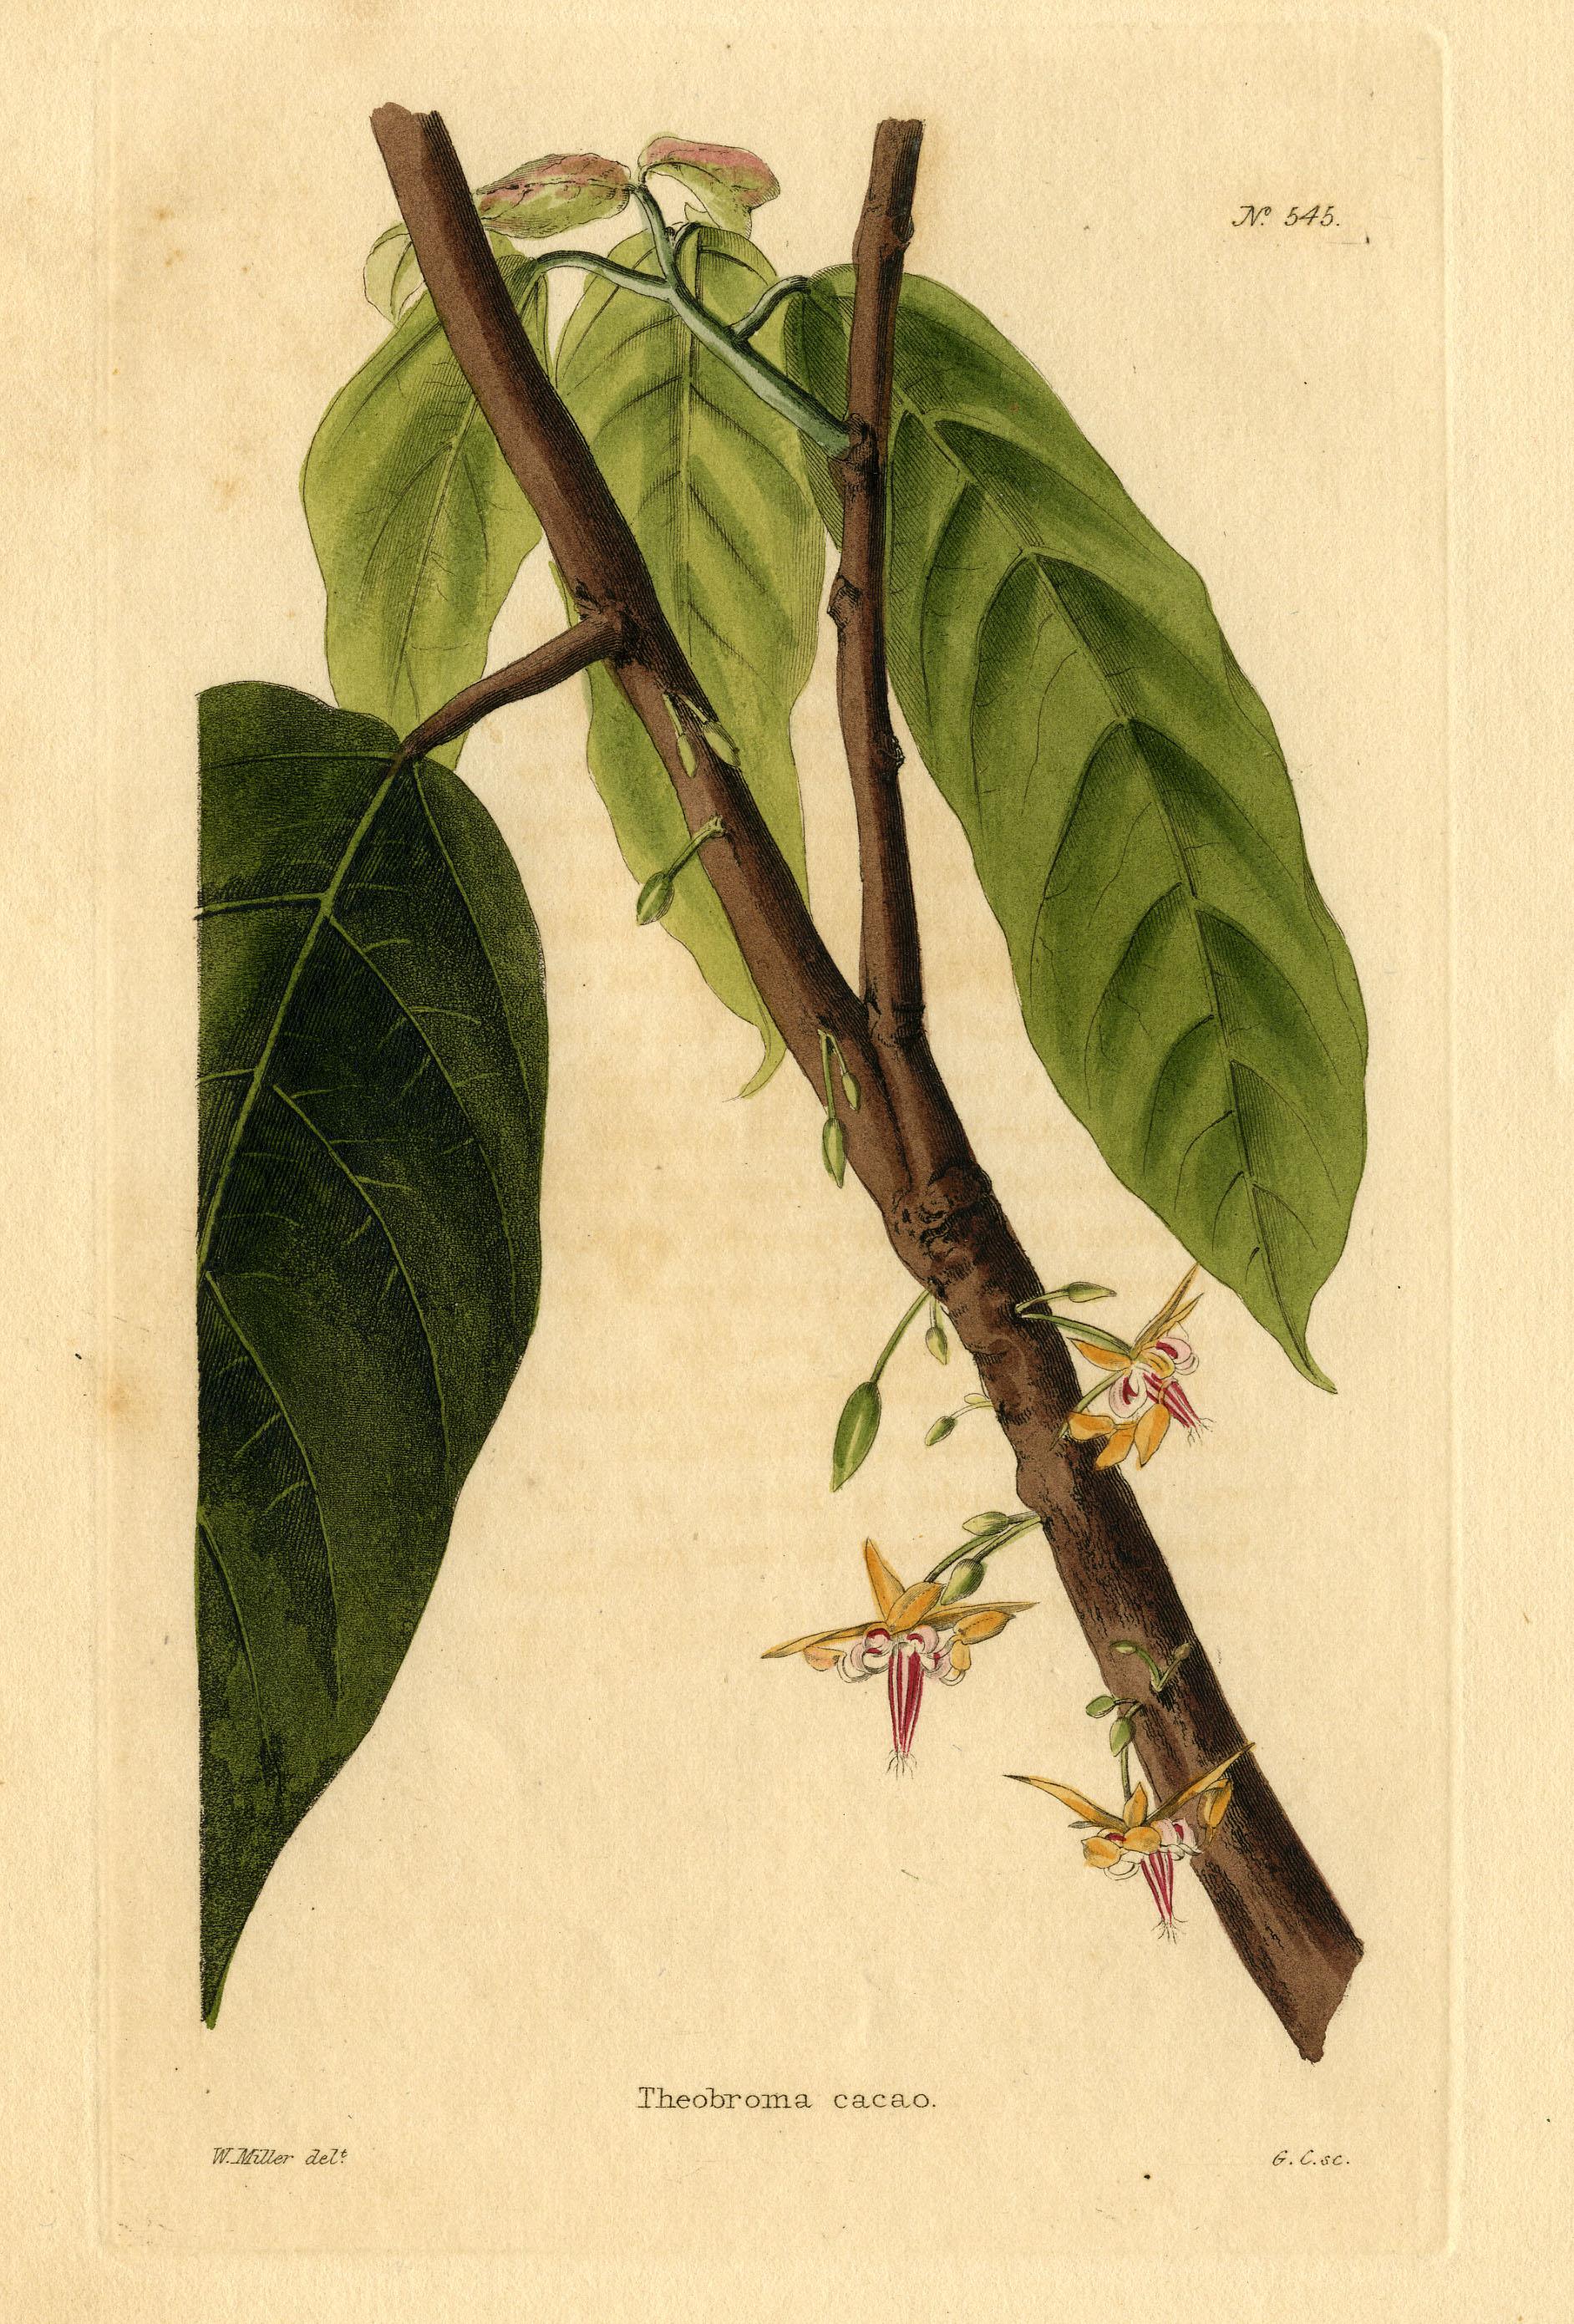 1884x2781 Fileloddiges 545 Theobroma Cacao Drawn By W Miller.jpg